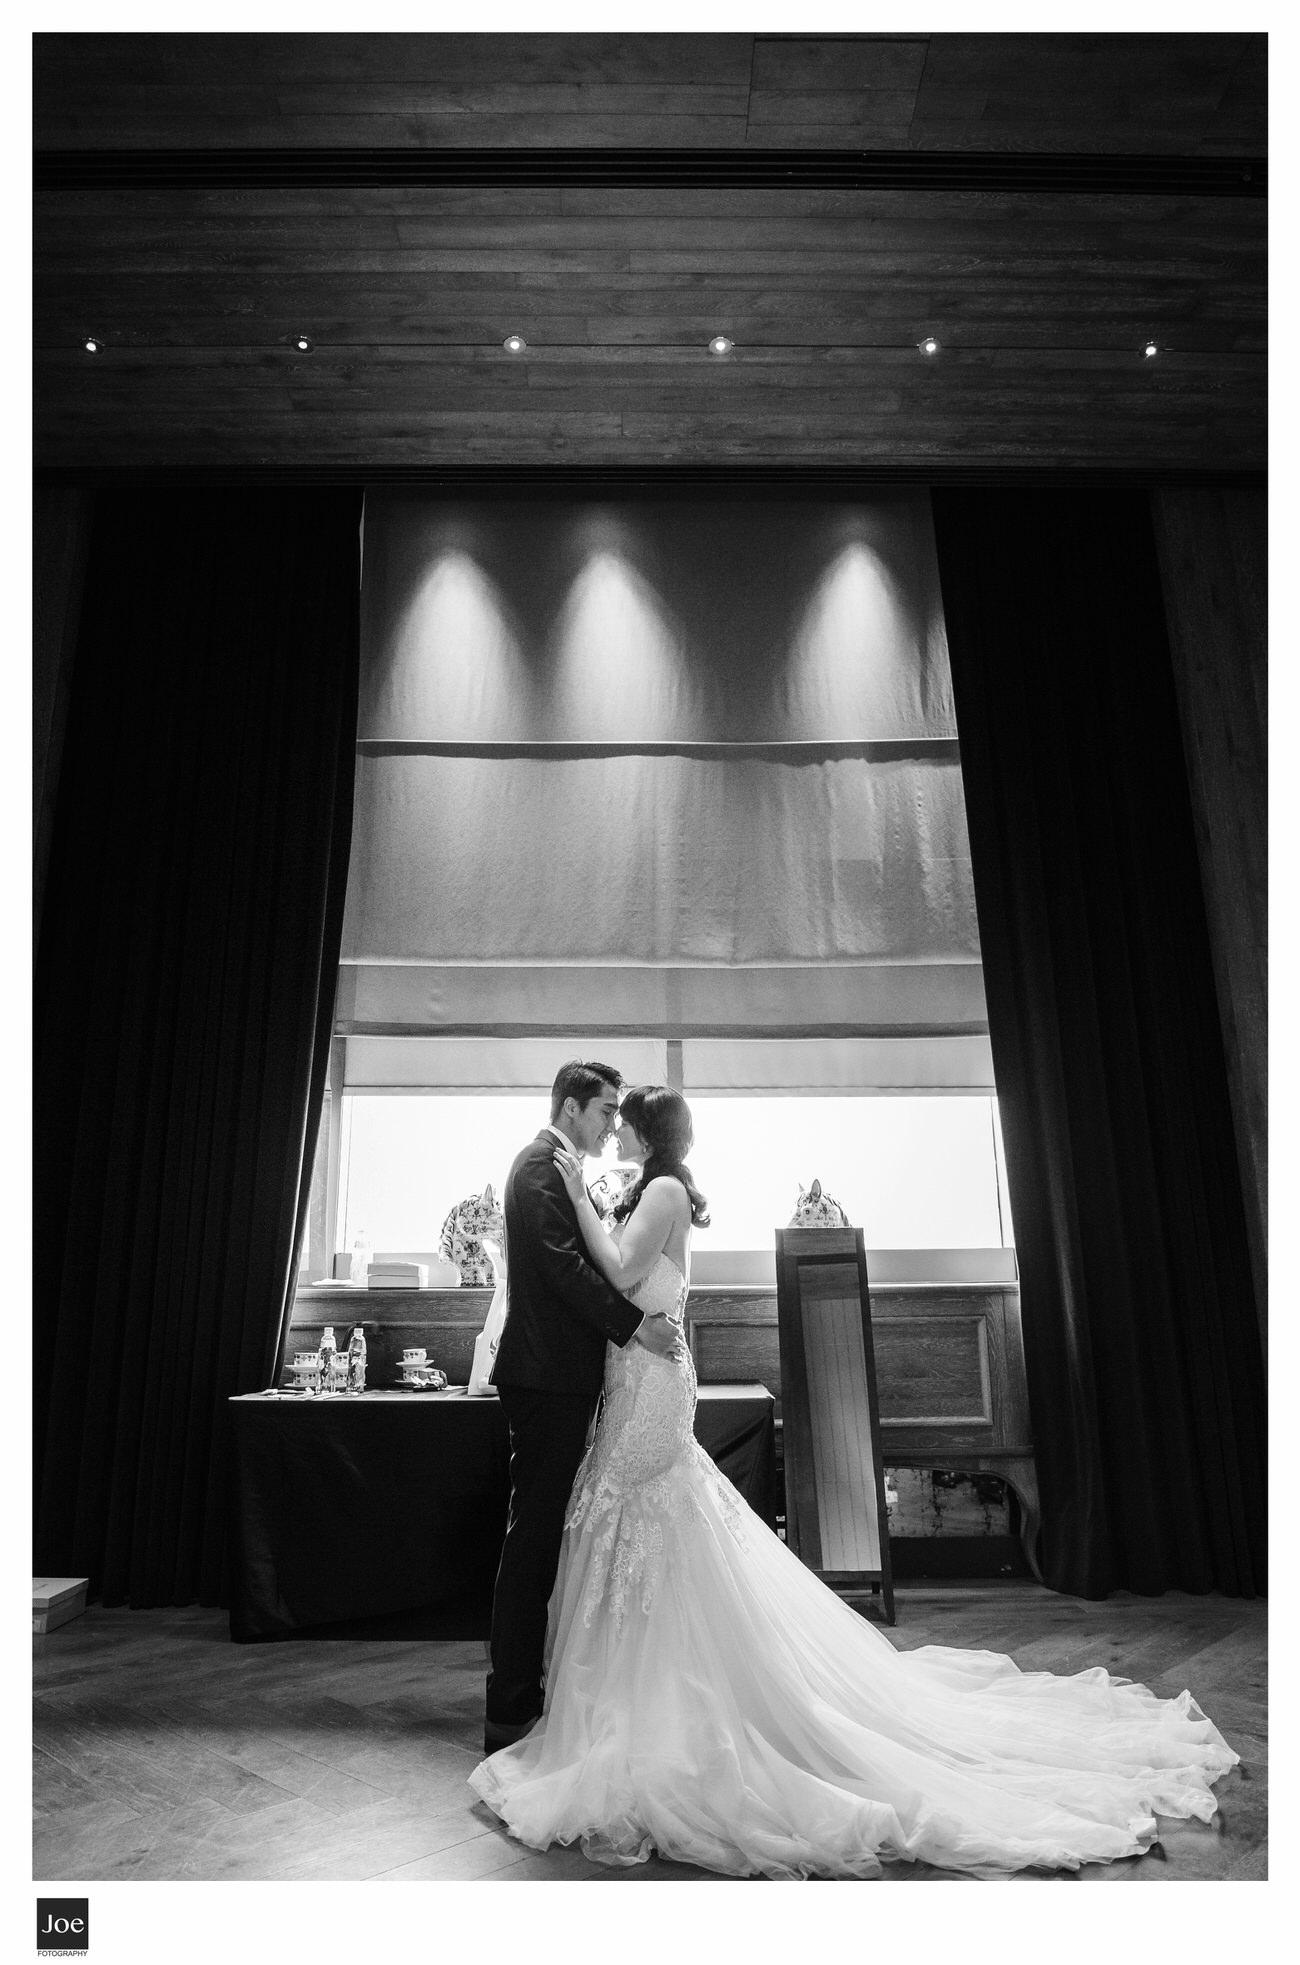 joe-fotography-wedding-photo-palais-de-chine-hotel-074.jpg